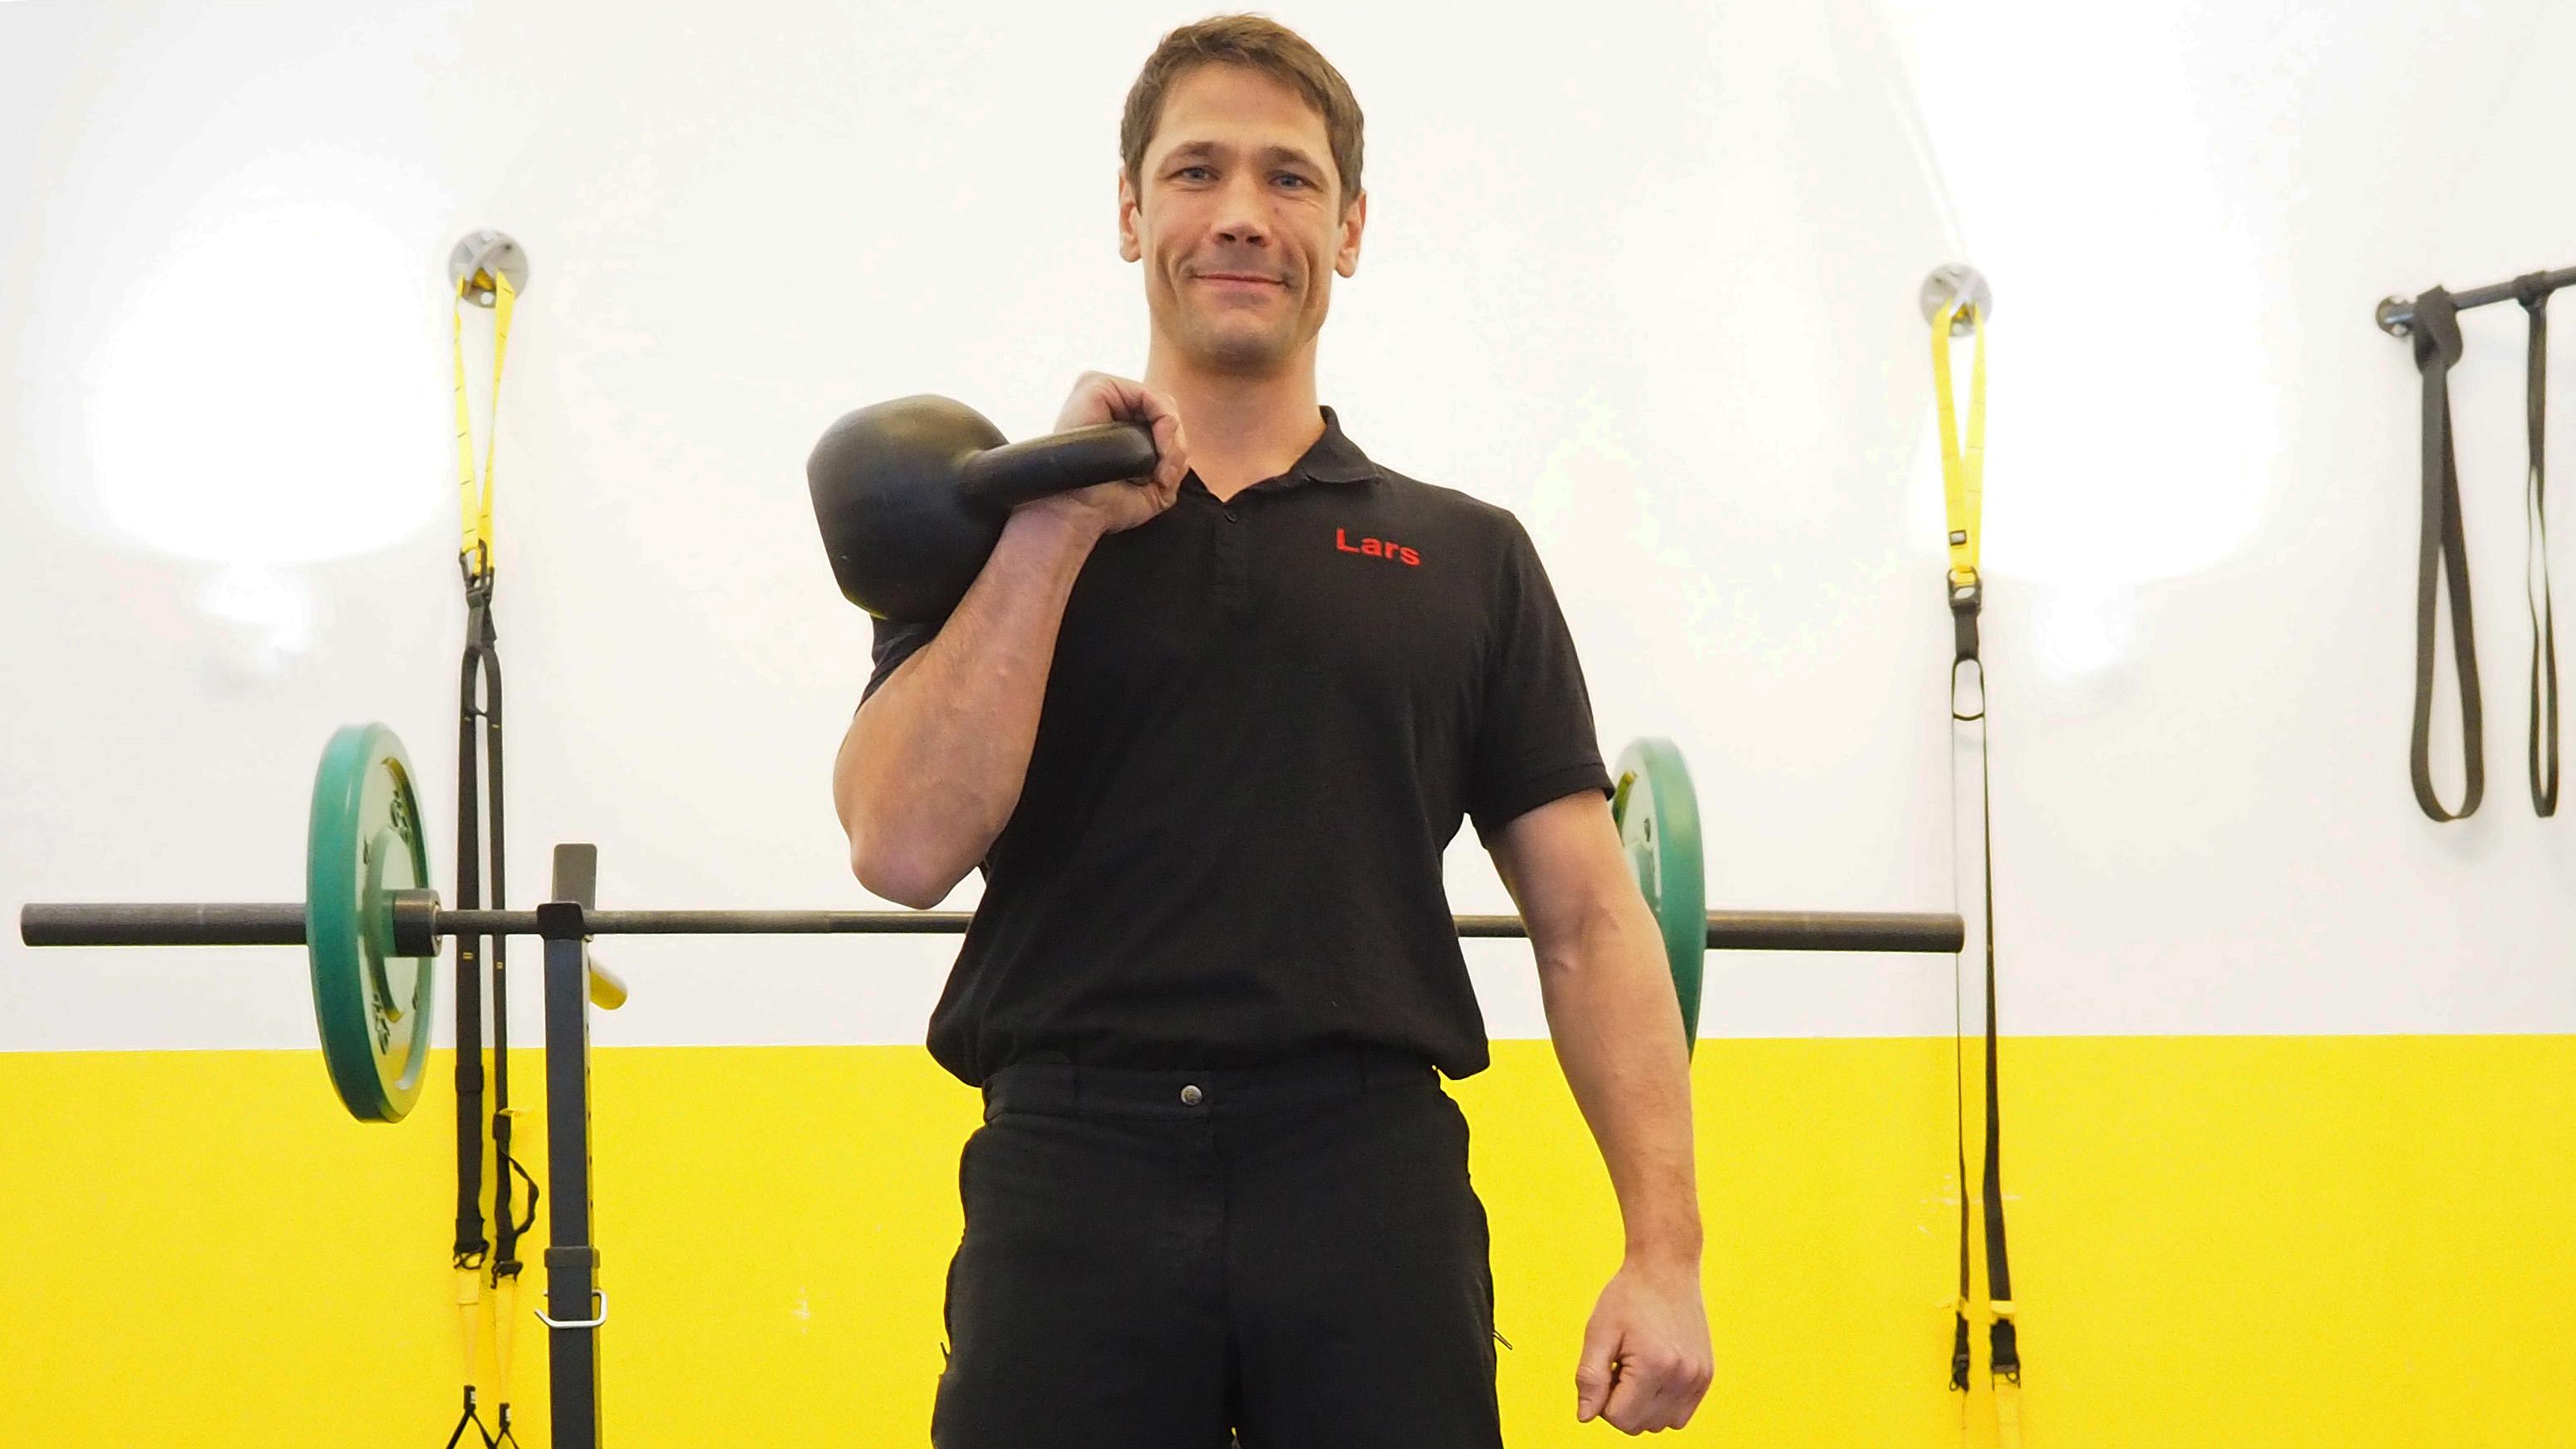 Personal Trainer Lars Rosenbaum mit Kettlebell